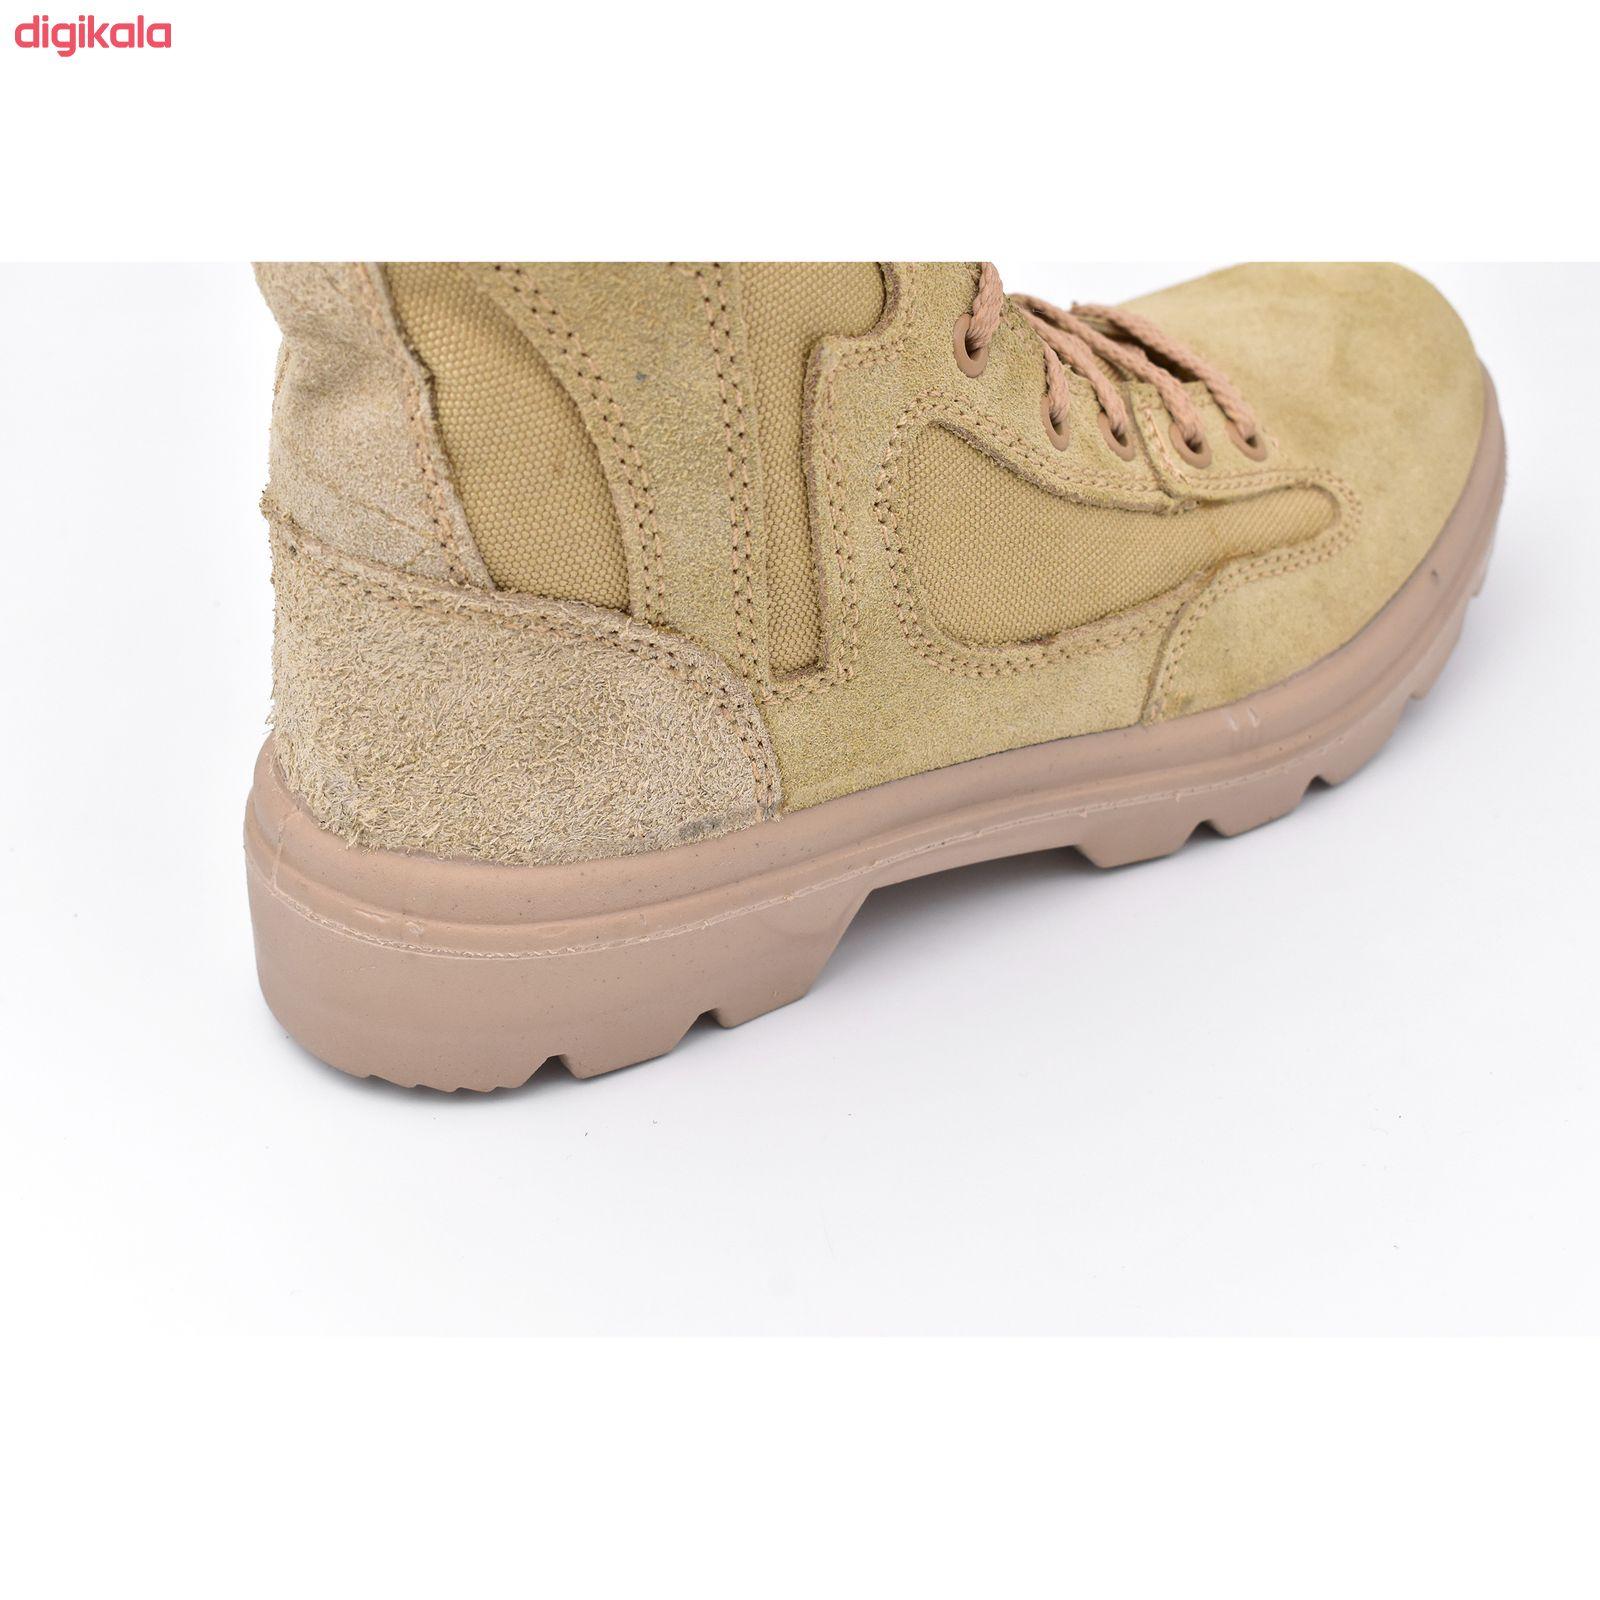 کفش کوهنوردی مردانه مدل Razm کد 8485 main 1 7